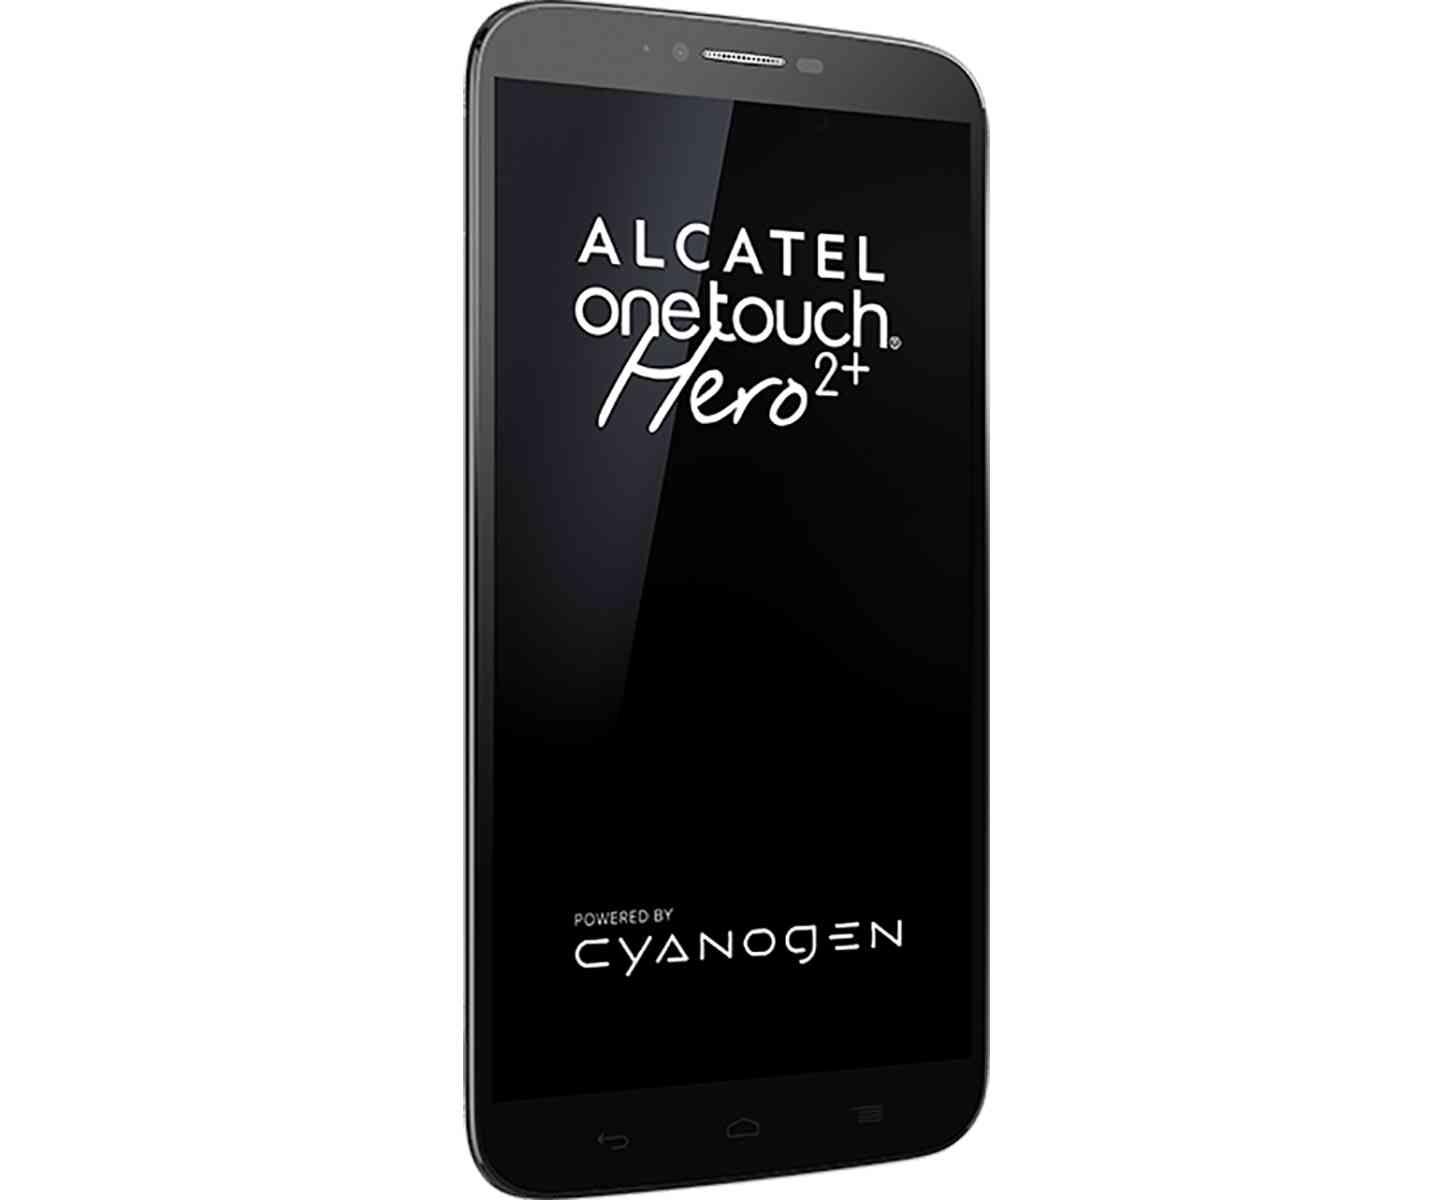 Alcatel Onetouch Hero 2+ Cyanogen OS official